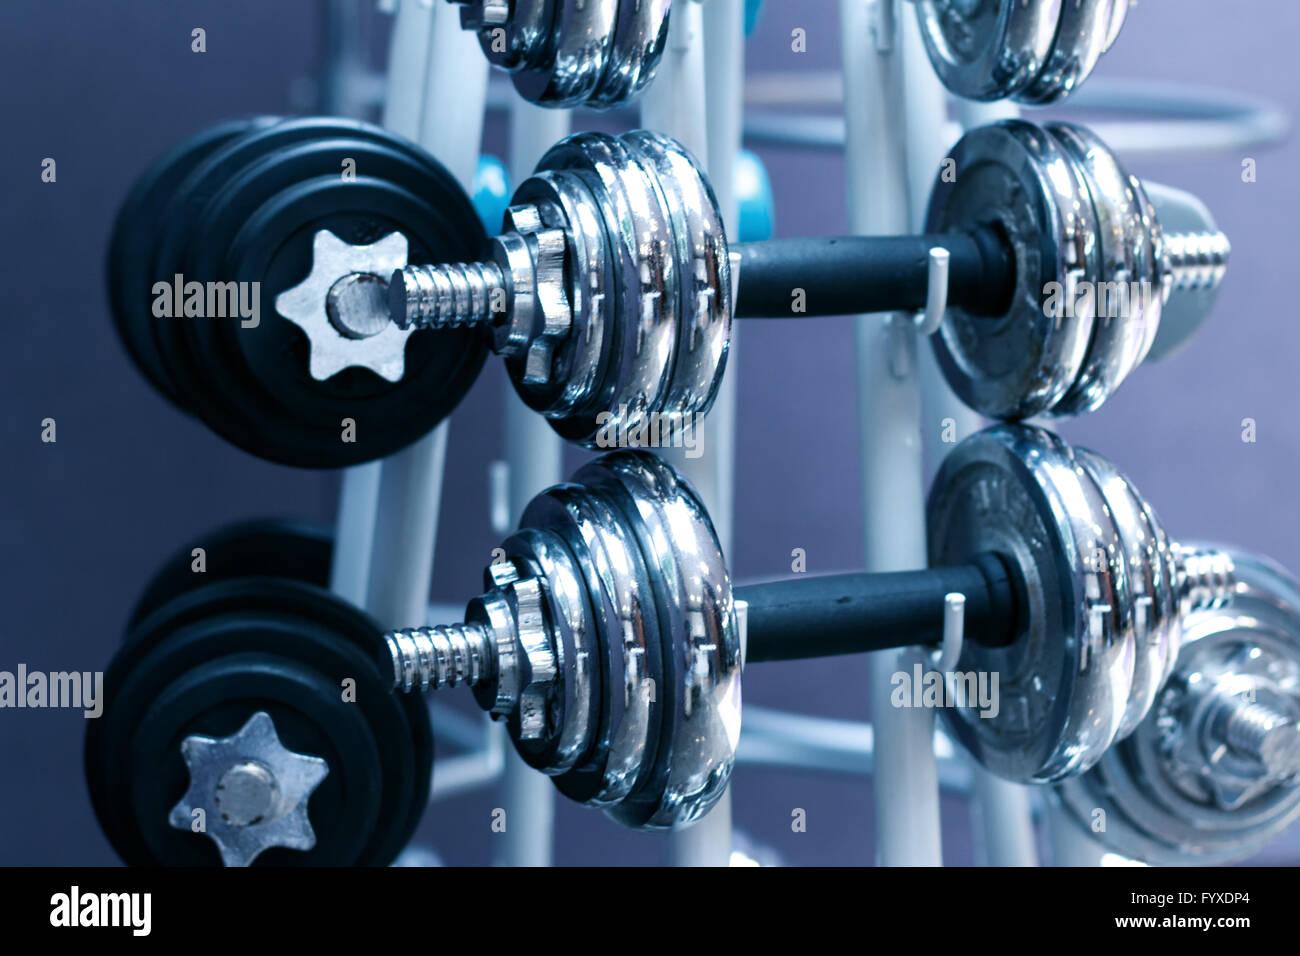 equipment in modern exercise room - Stock Image